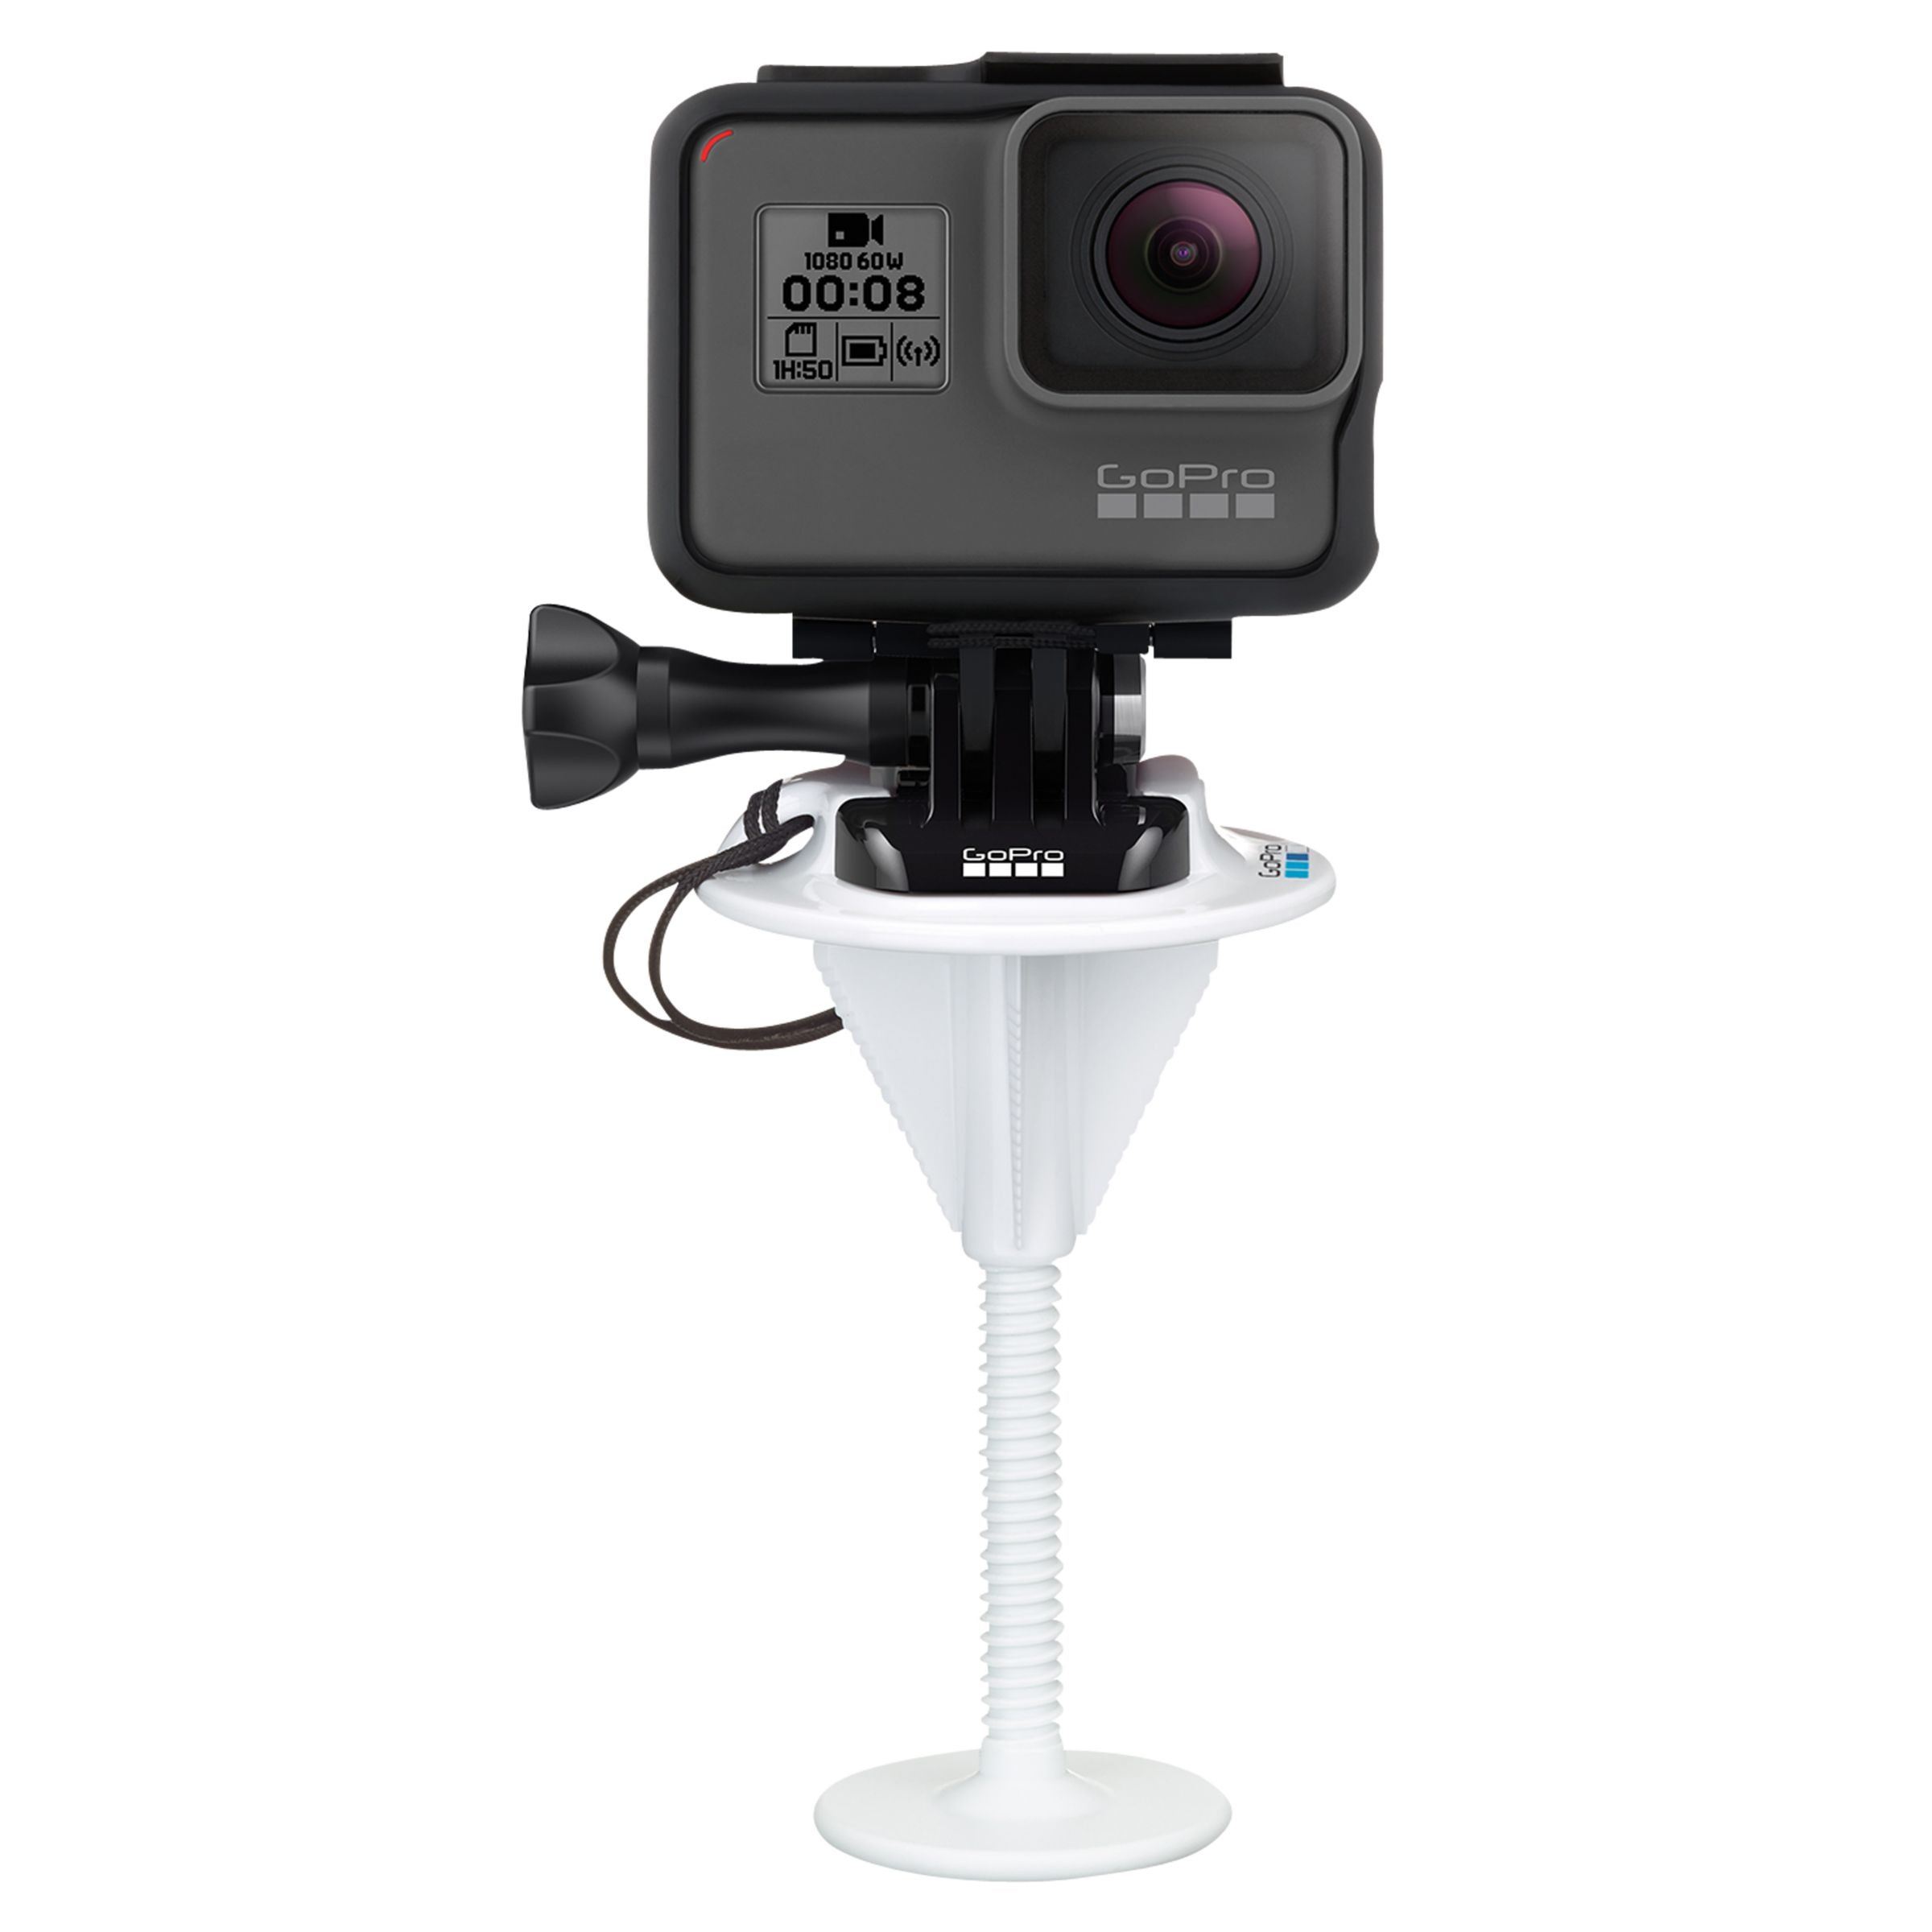 Gopro GoPro Bodyboard Mount for All GoPros